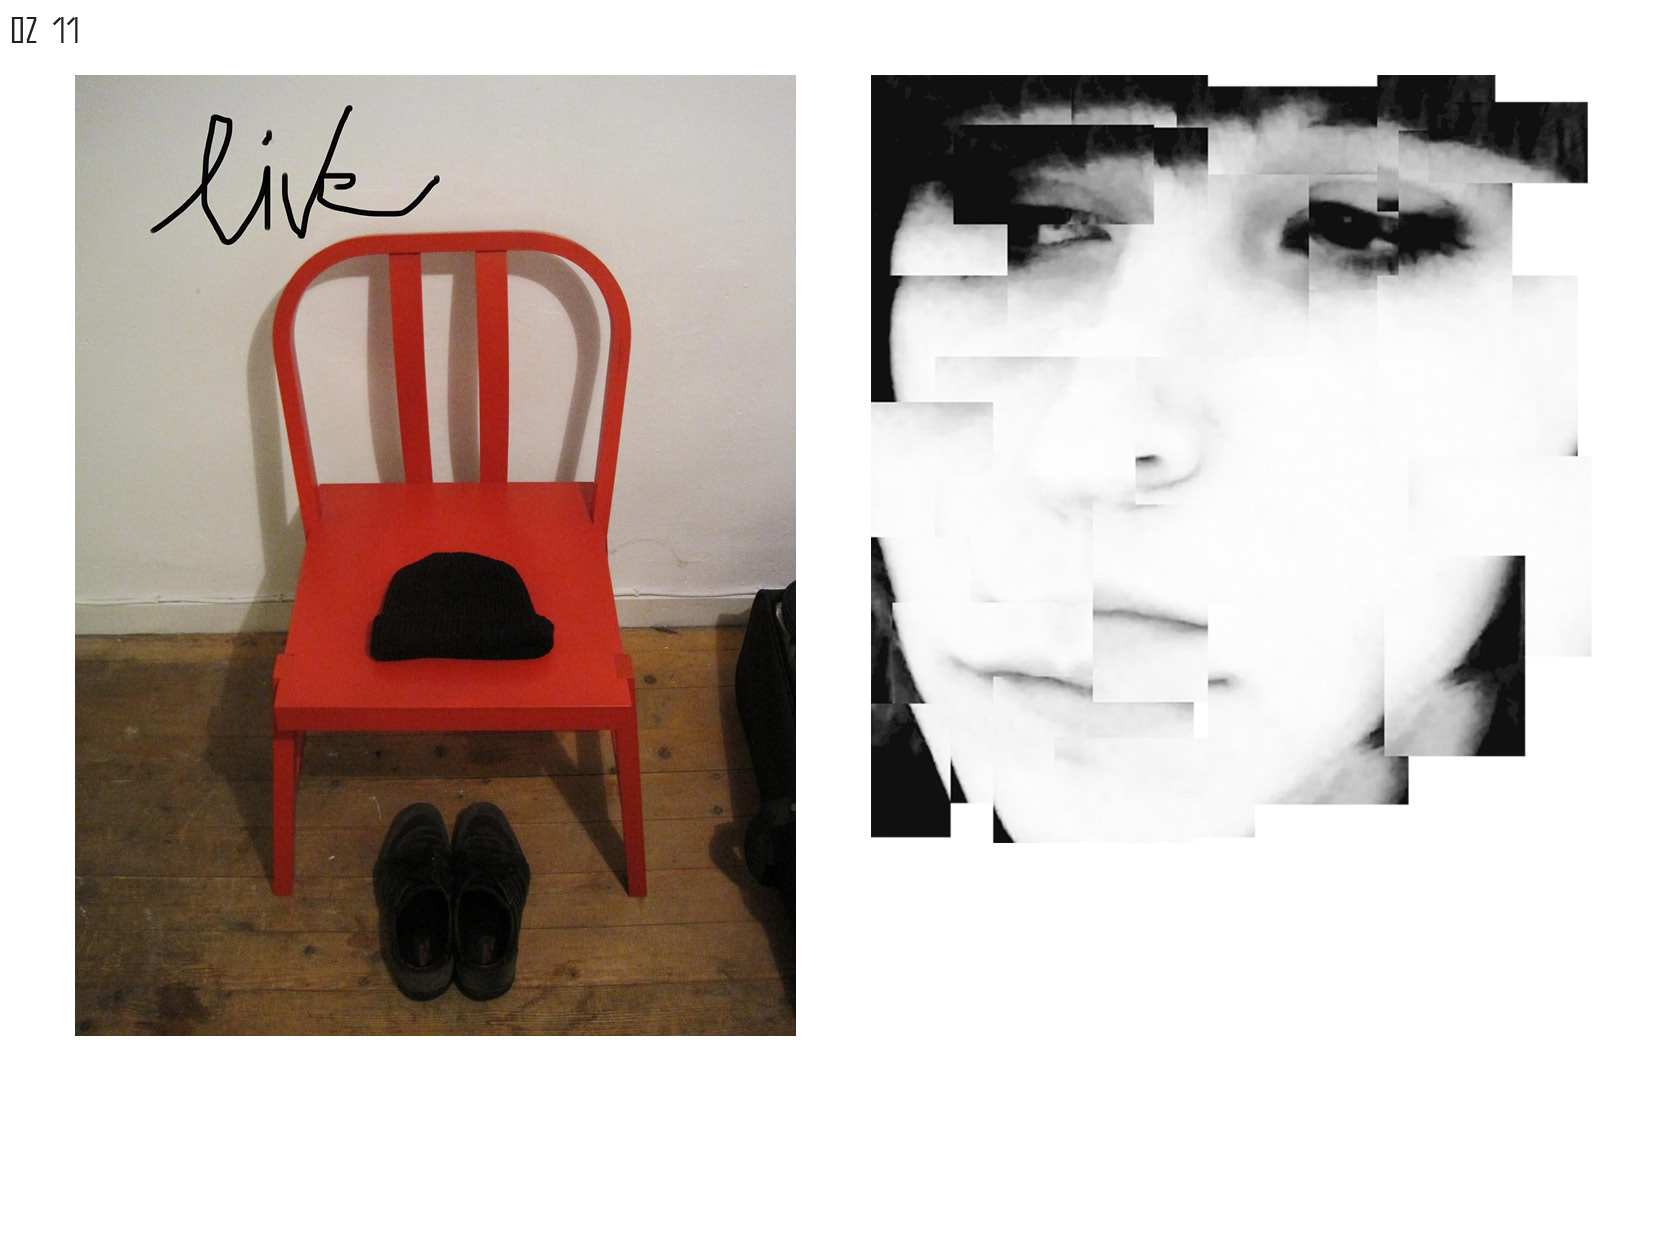 Gerrit-Schweiger-Dialog-Städte-Paris-Berlin-Jessica-Blank-Experiment-Fotoserie-Tagebuch-visuelle-Kommunikation-17